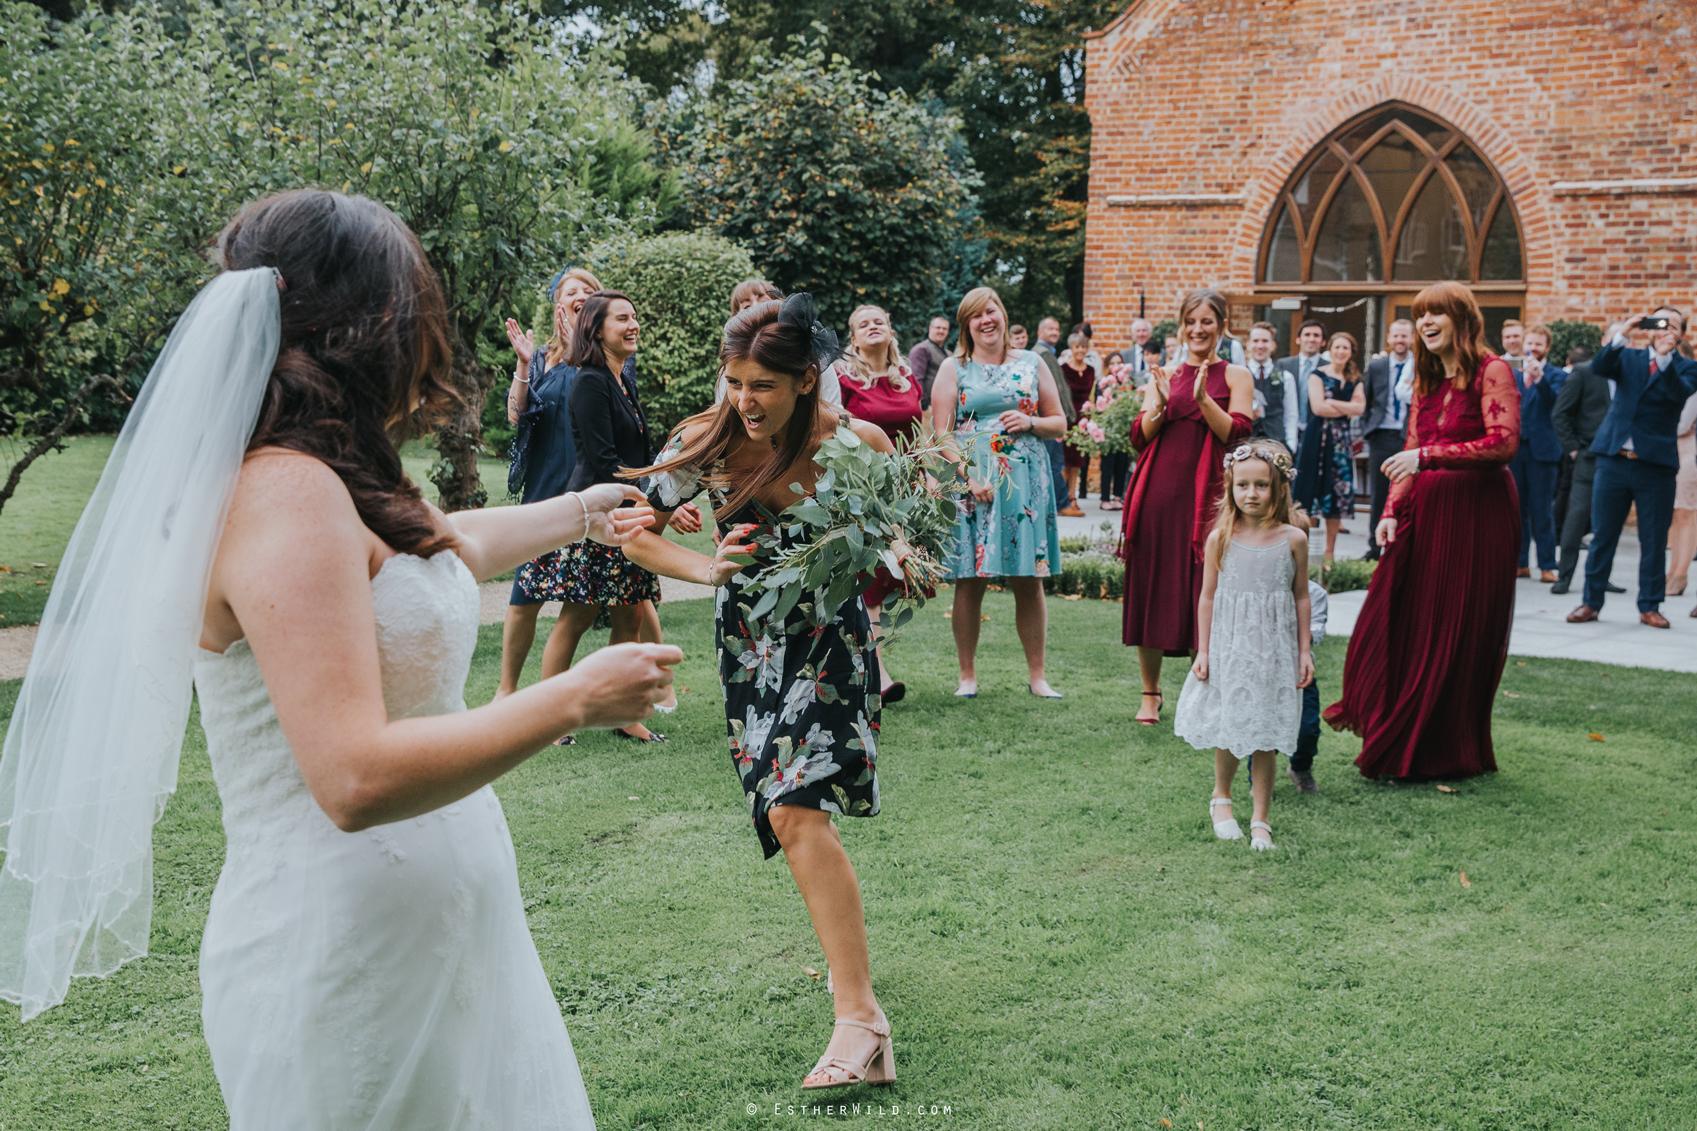 Reading_Room_Weddings_Alby_Norwich_Photographer_Esther_Wild_IMG_1622.jpg